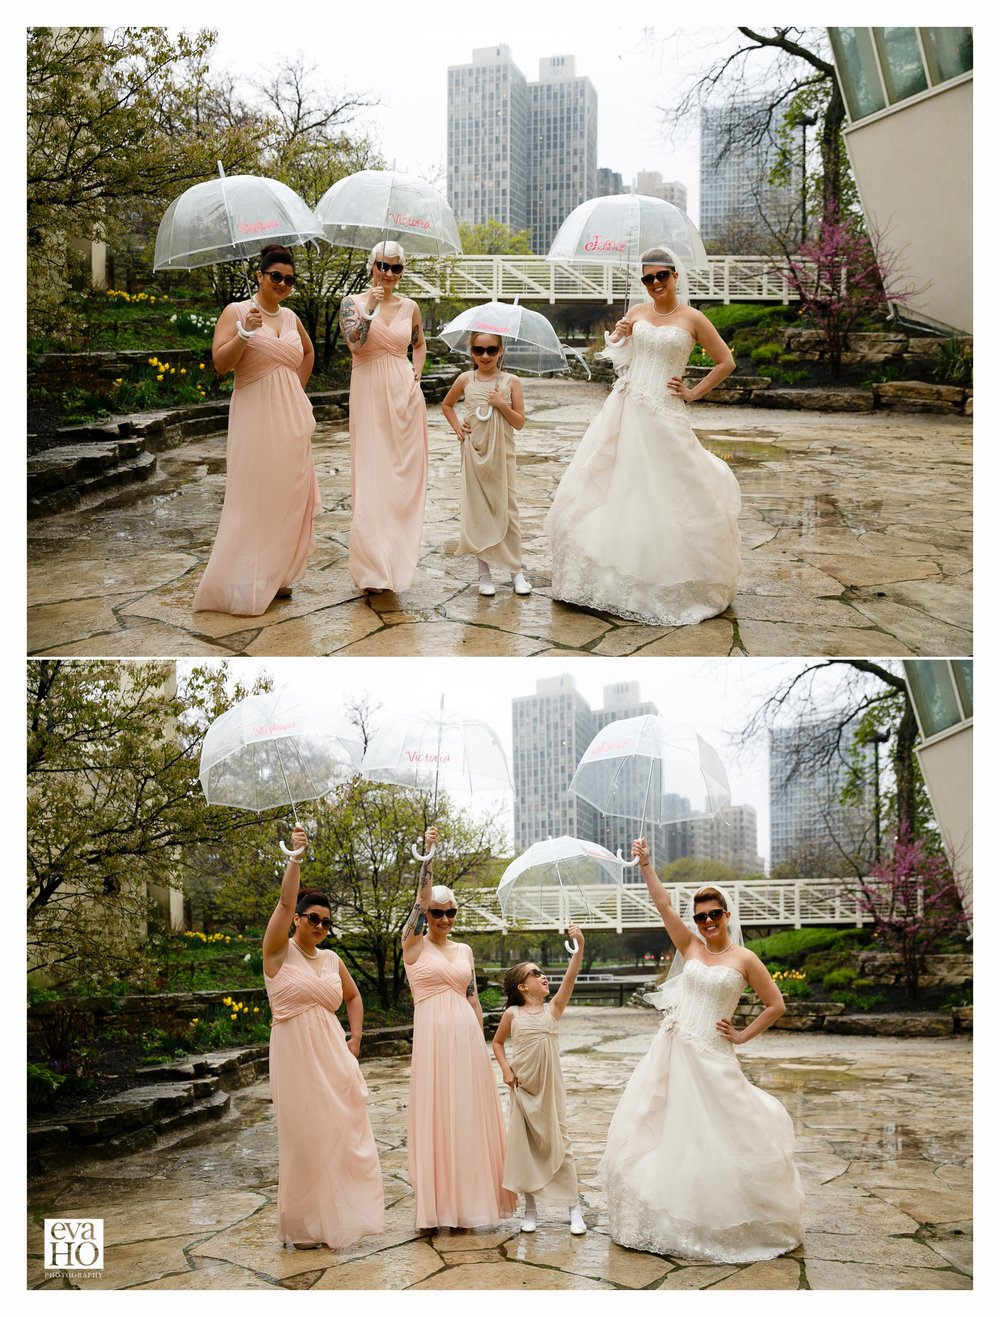 A little rain won't stop this fabulous wedding party!